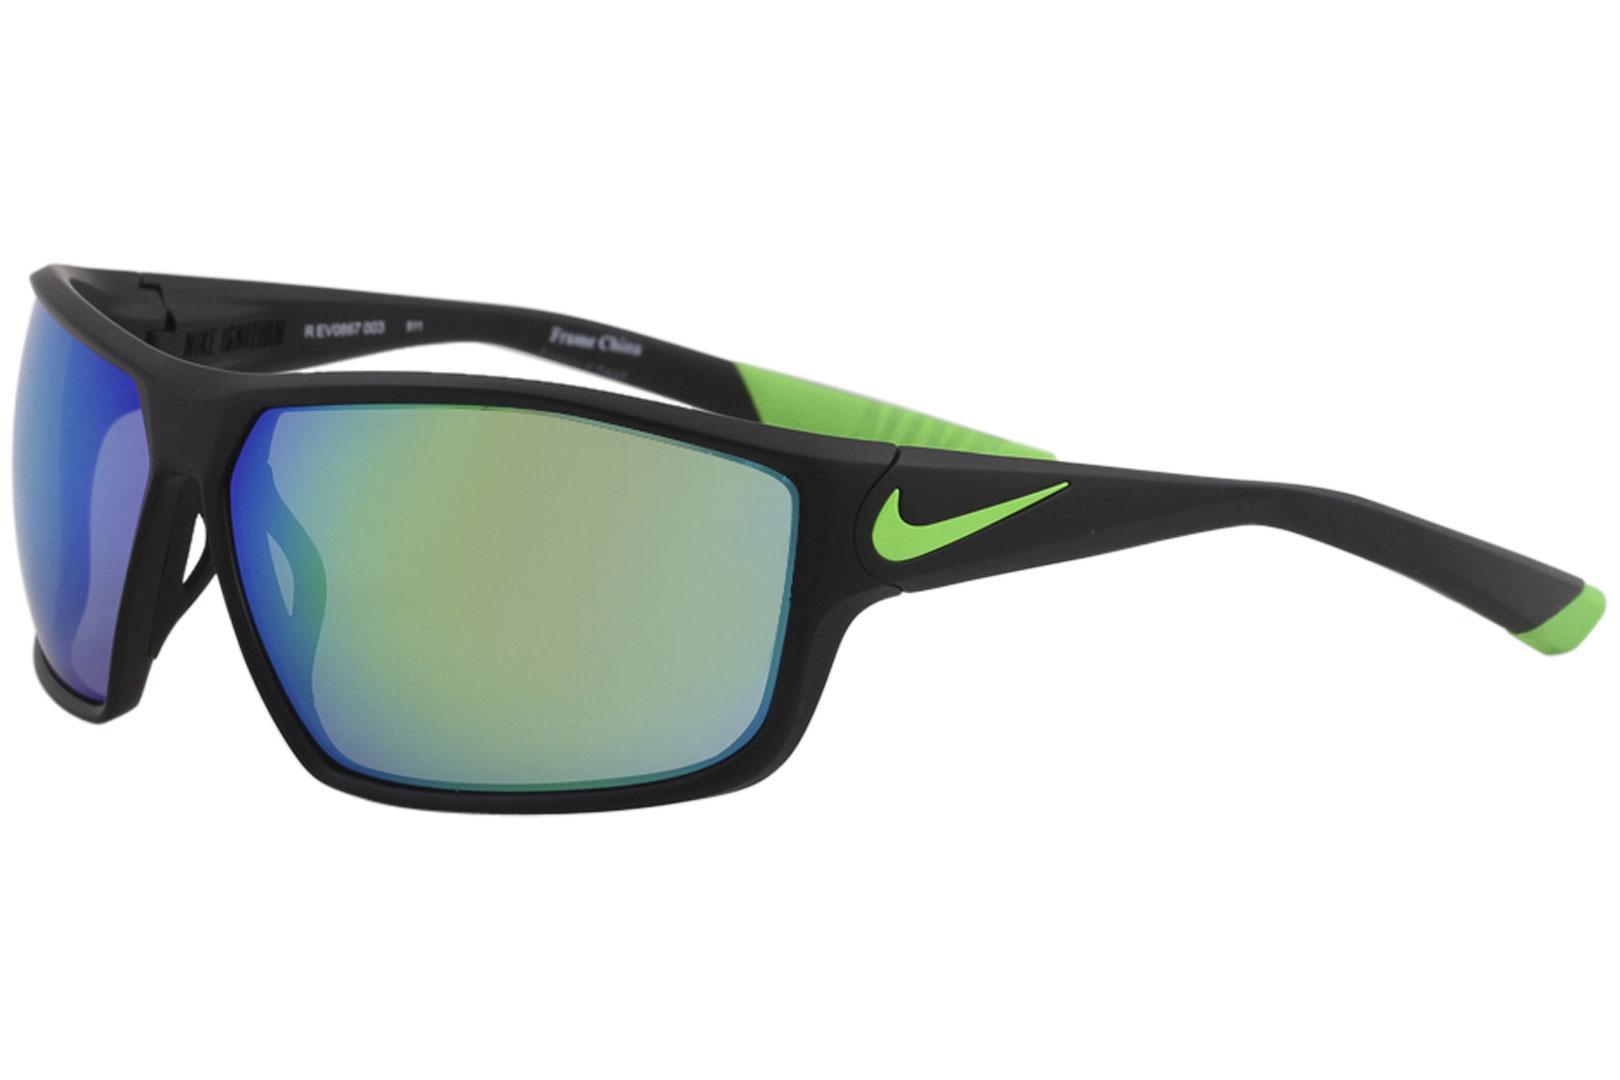 17a8cd76b5 Nike Men s Ignition Sport Square Sunglasses